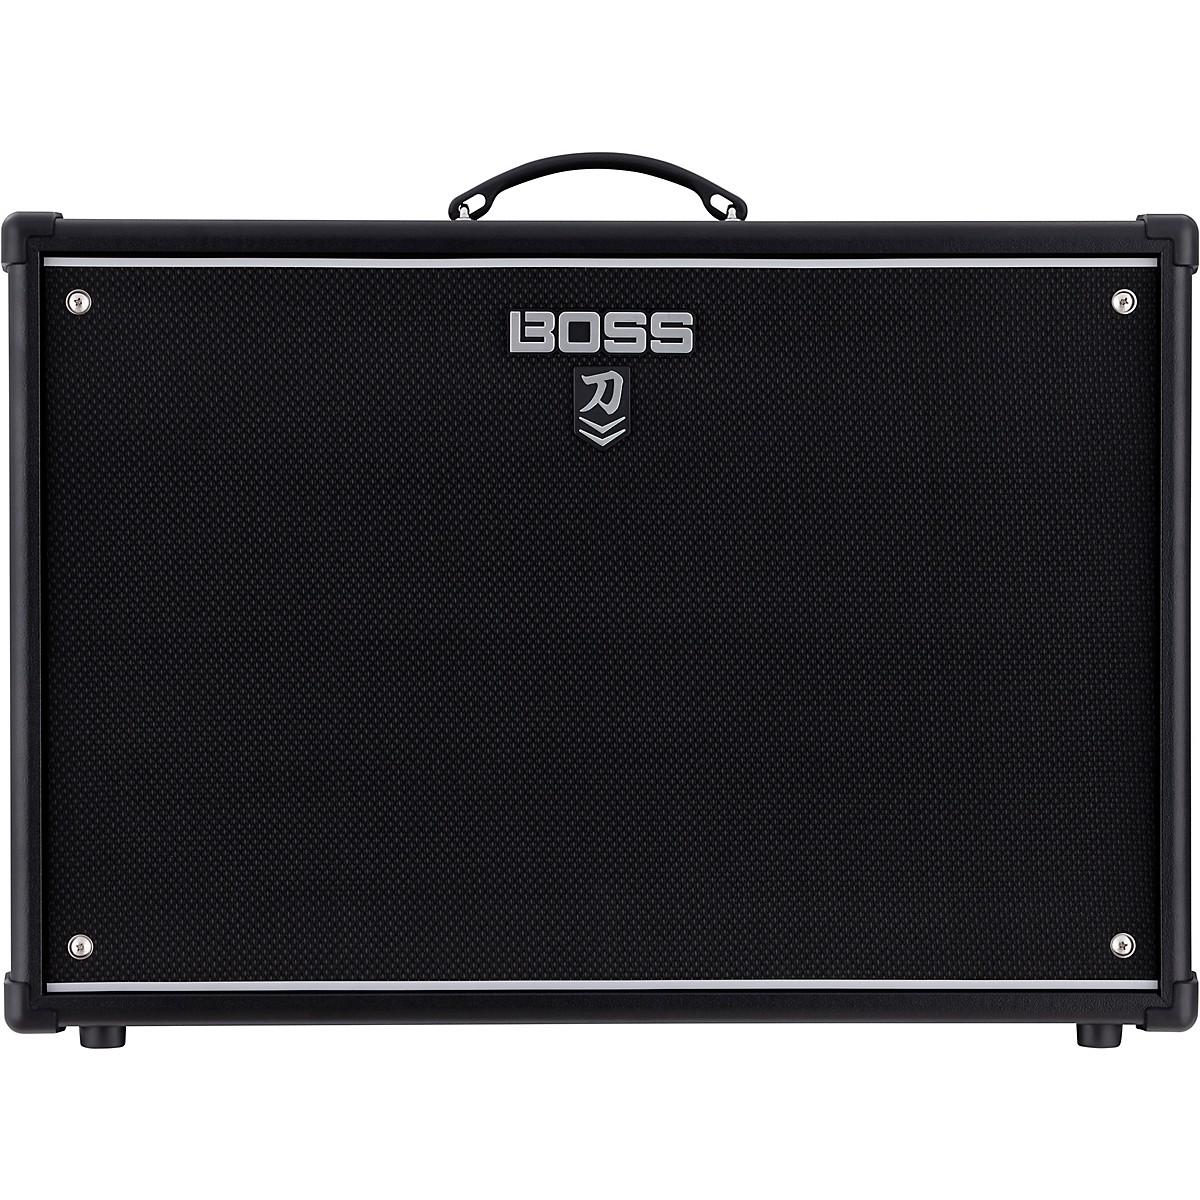 Boss Katana-100/212 MkII 100W 2x12 Guitar Combo Amplifier